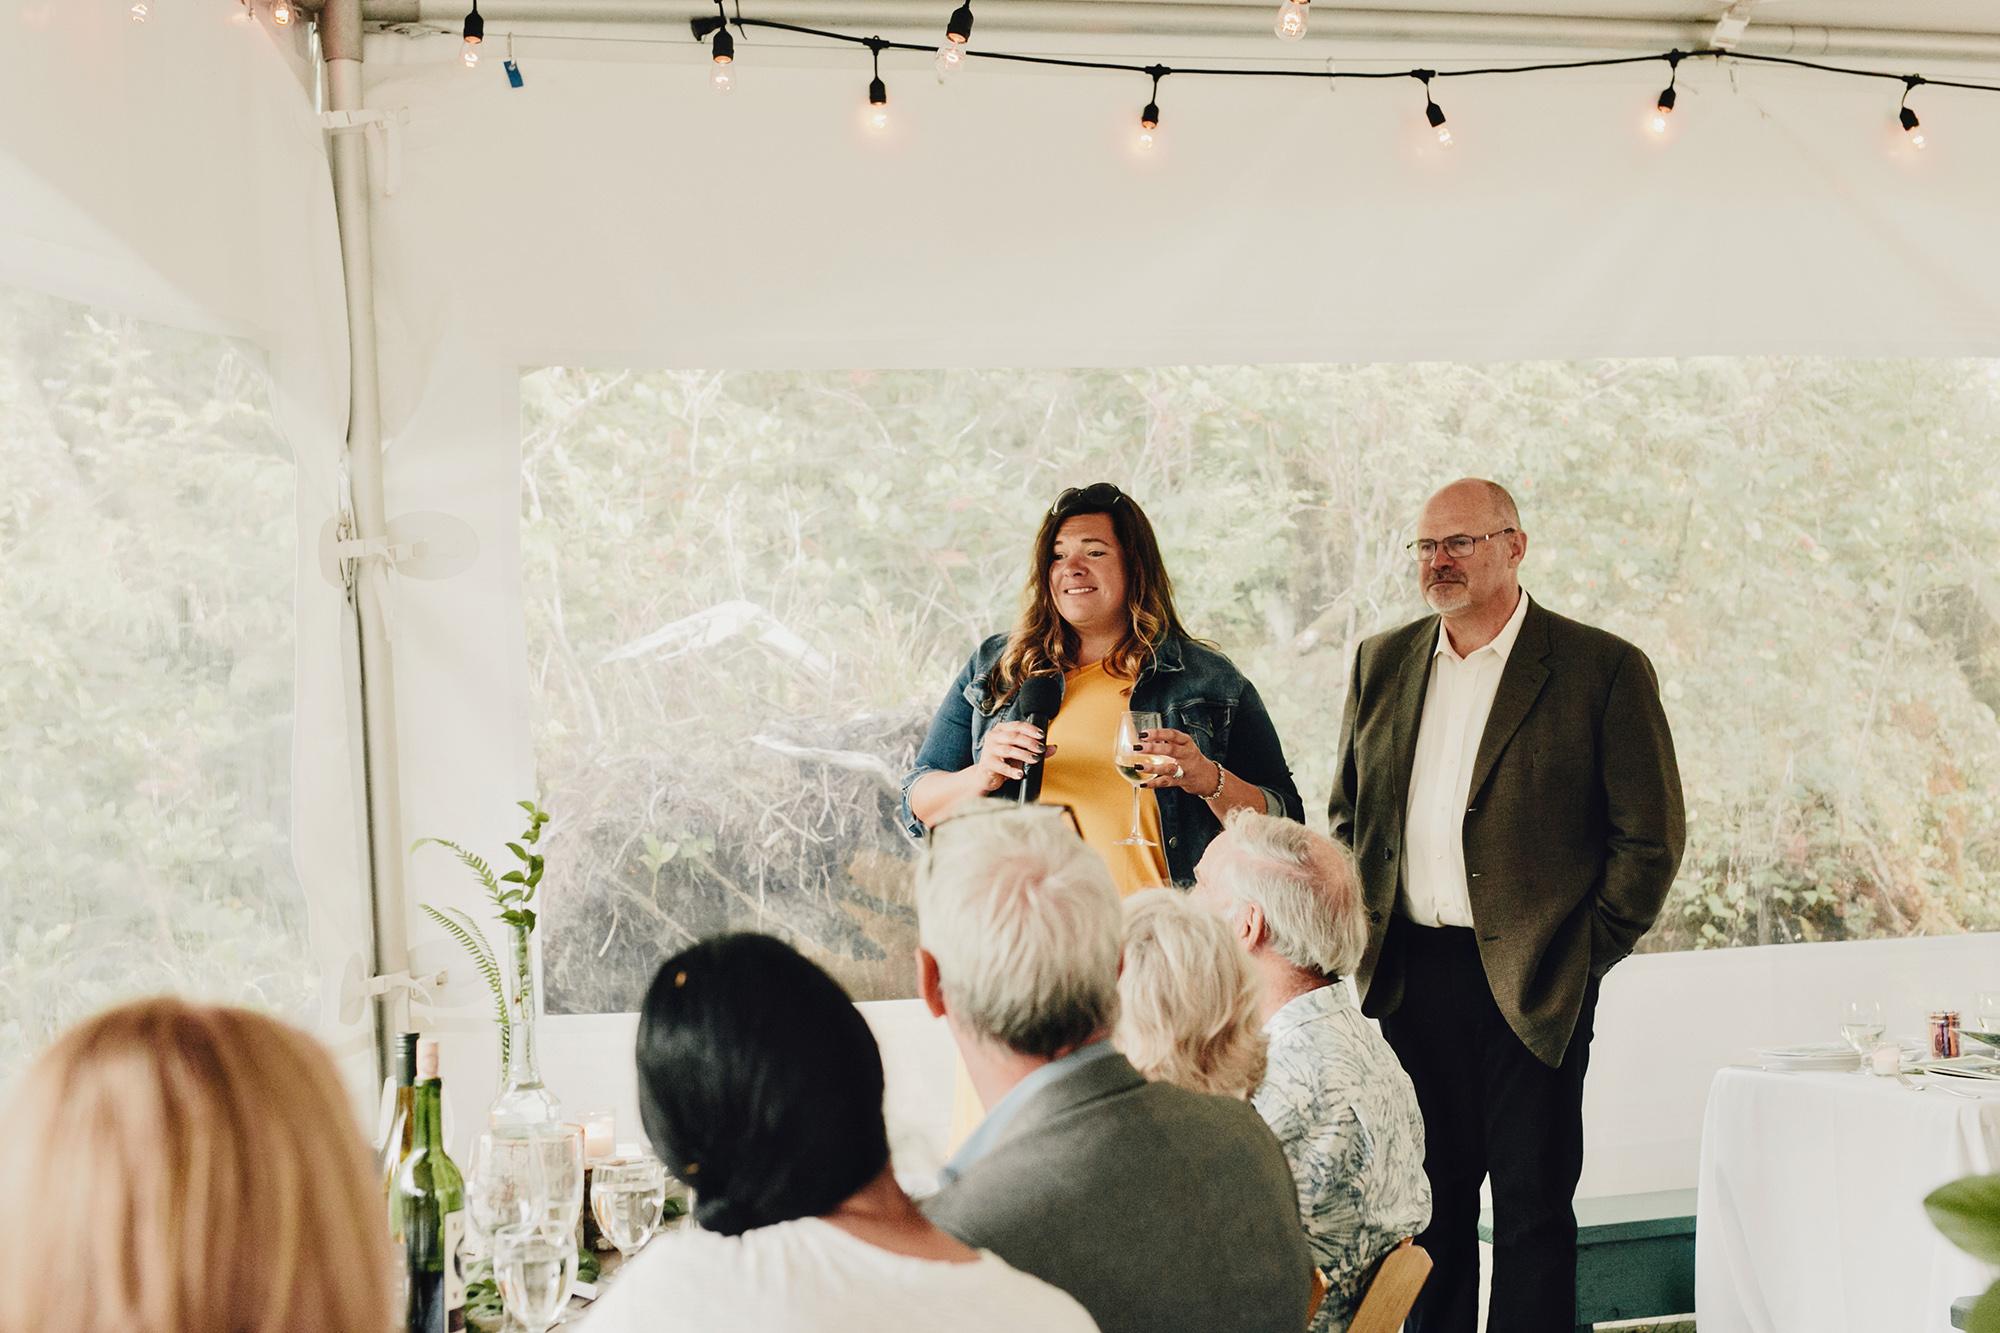 Tofino-Botanical-Gardens-Wedding-Photos-0125.jpg